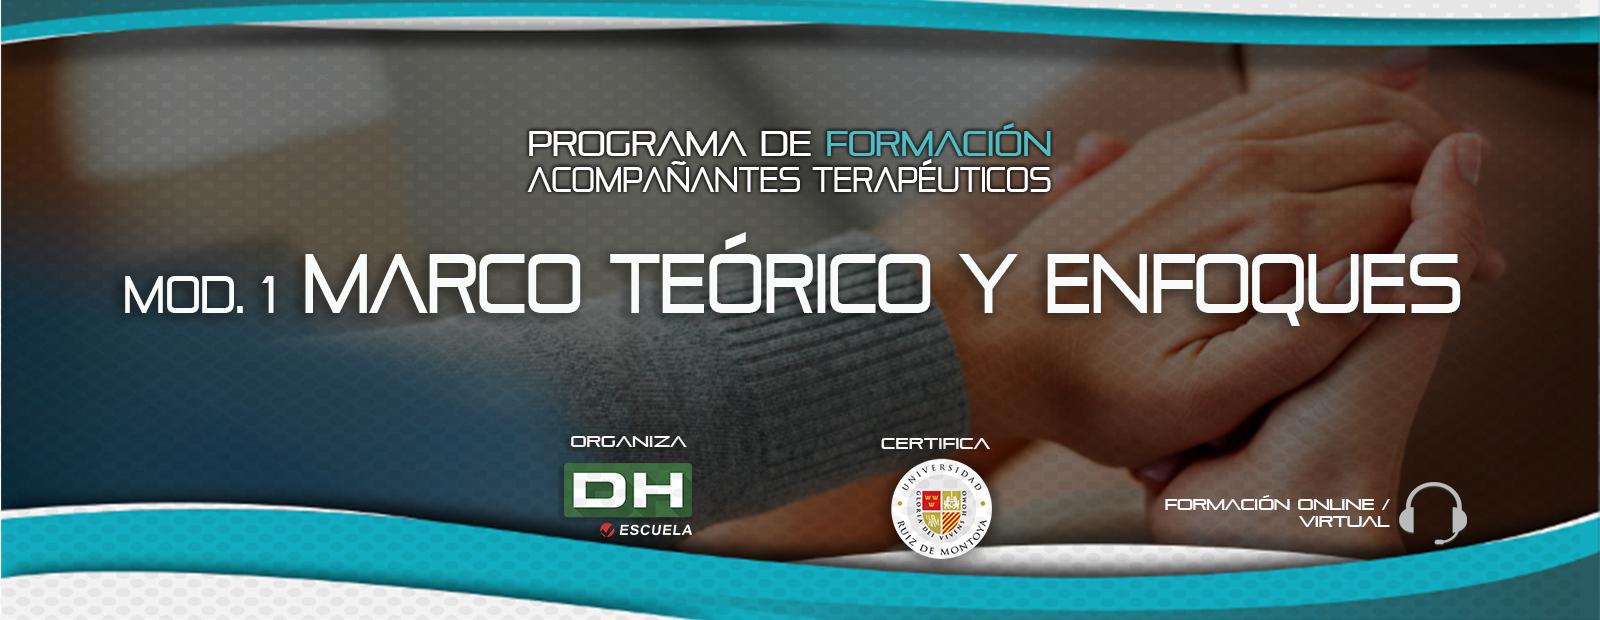 Módulo 01 MARCO TEÓRICO, LEGAL y ENFOQUES